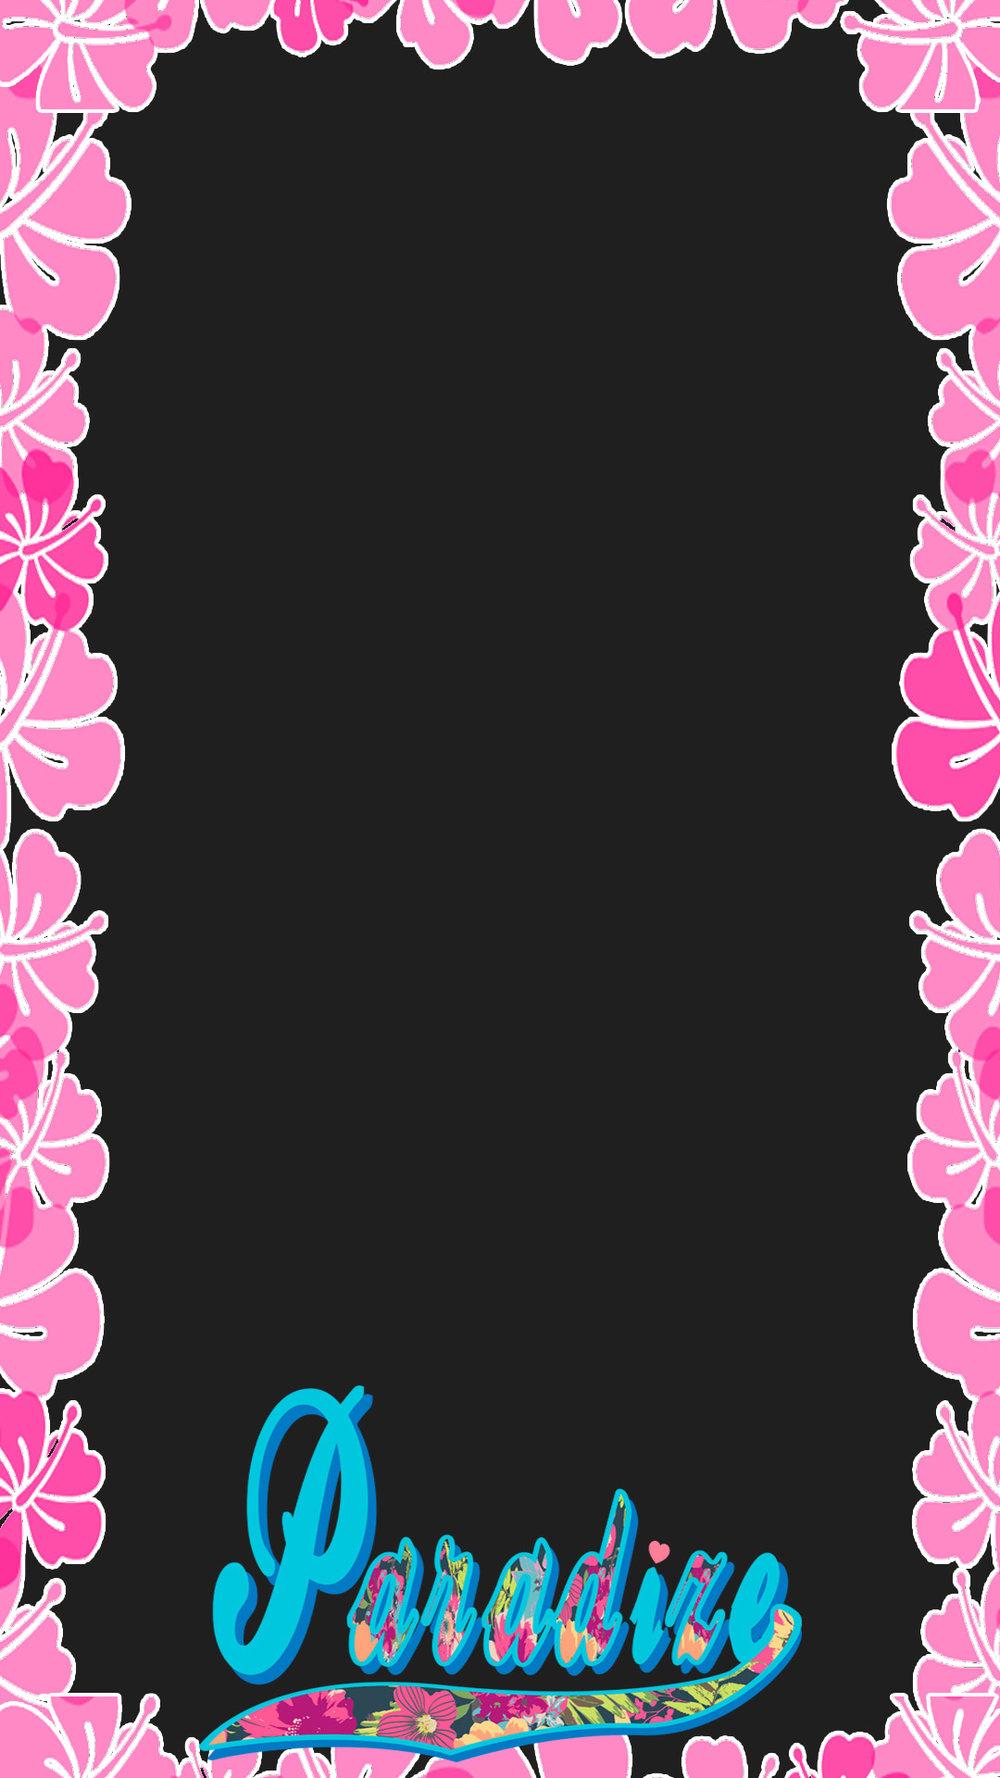 Zoe Arad Fiji pink flowers (1).jpg